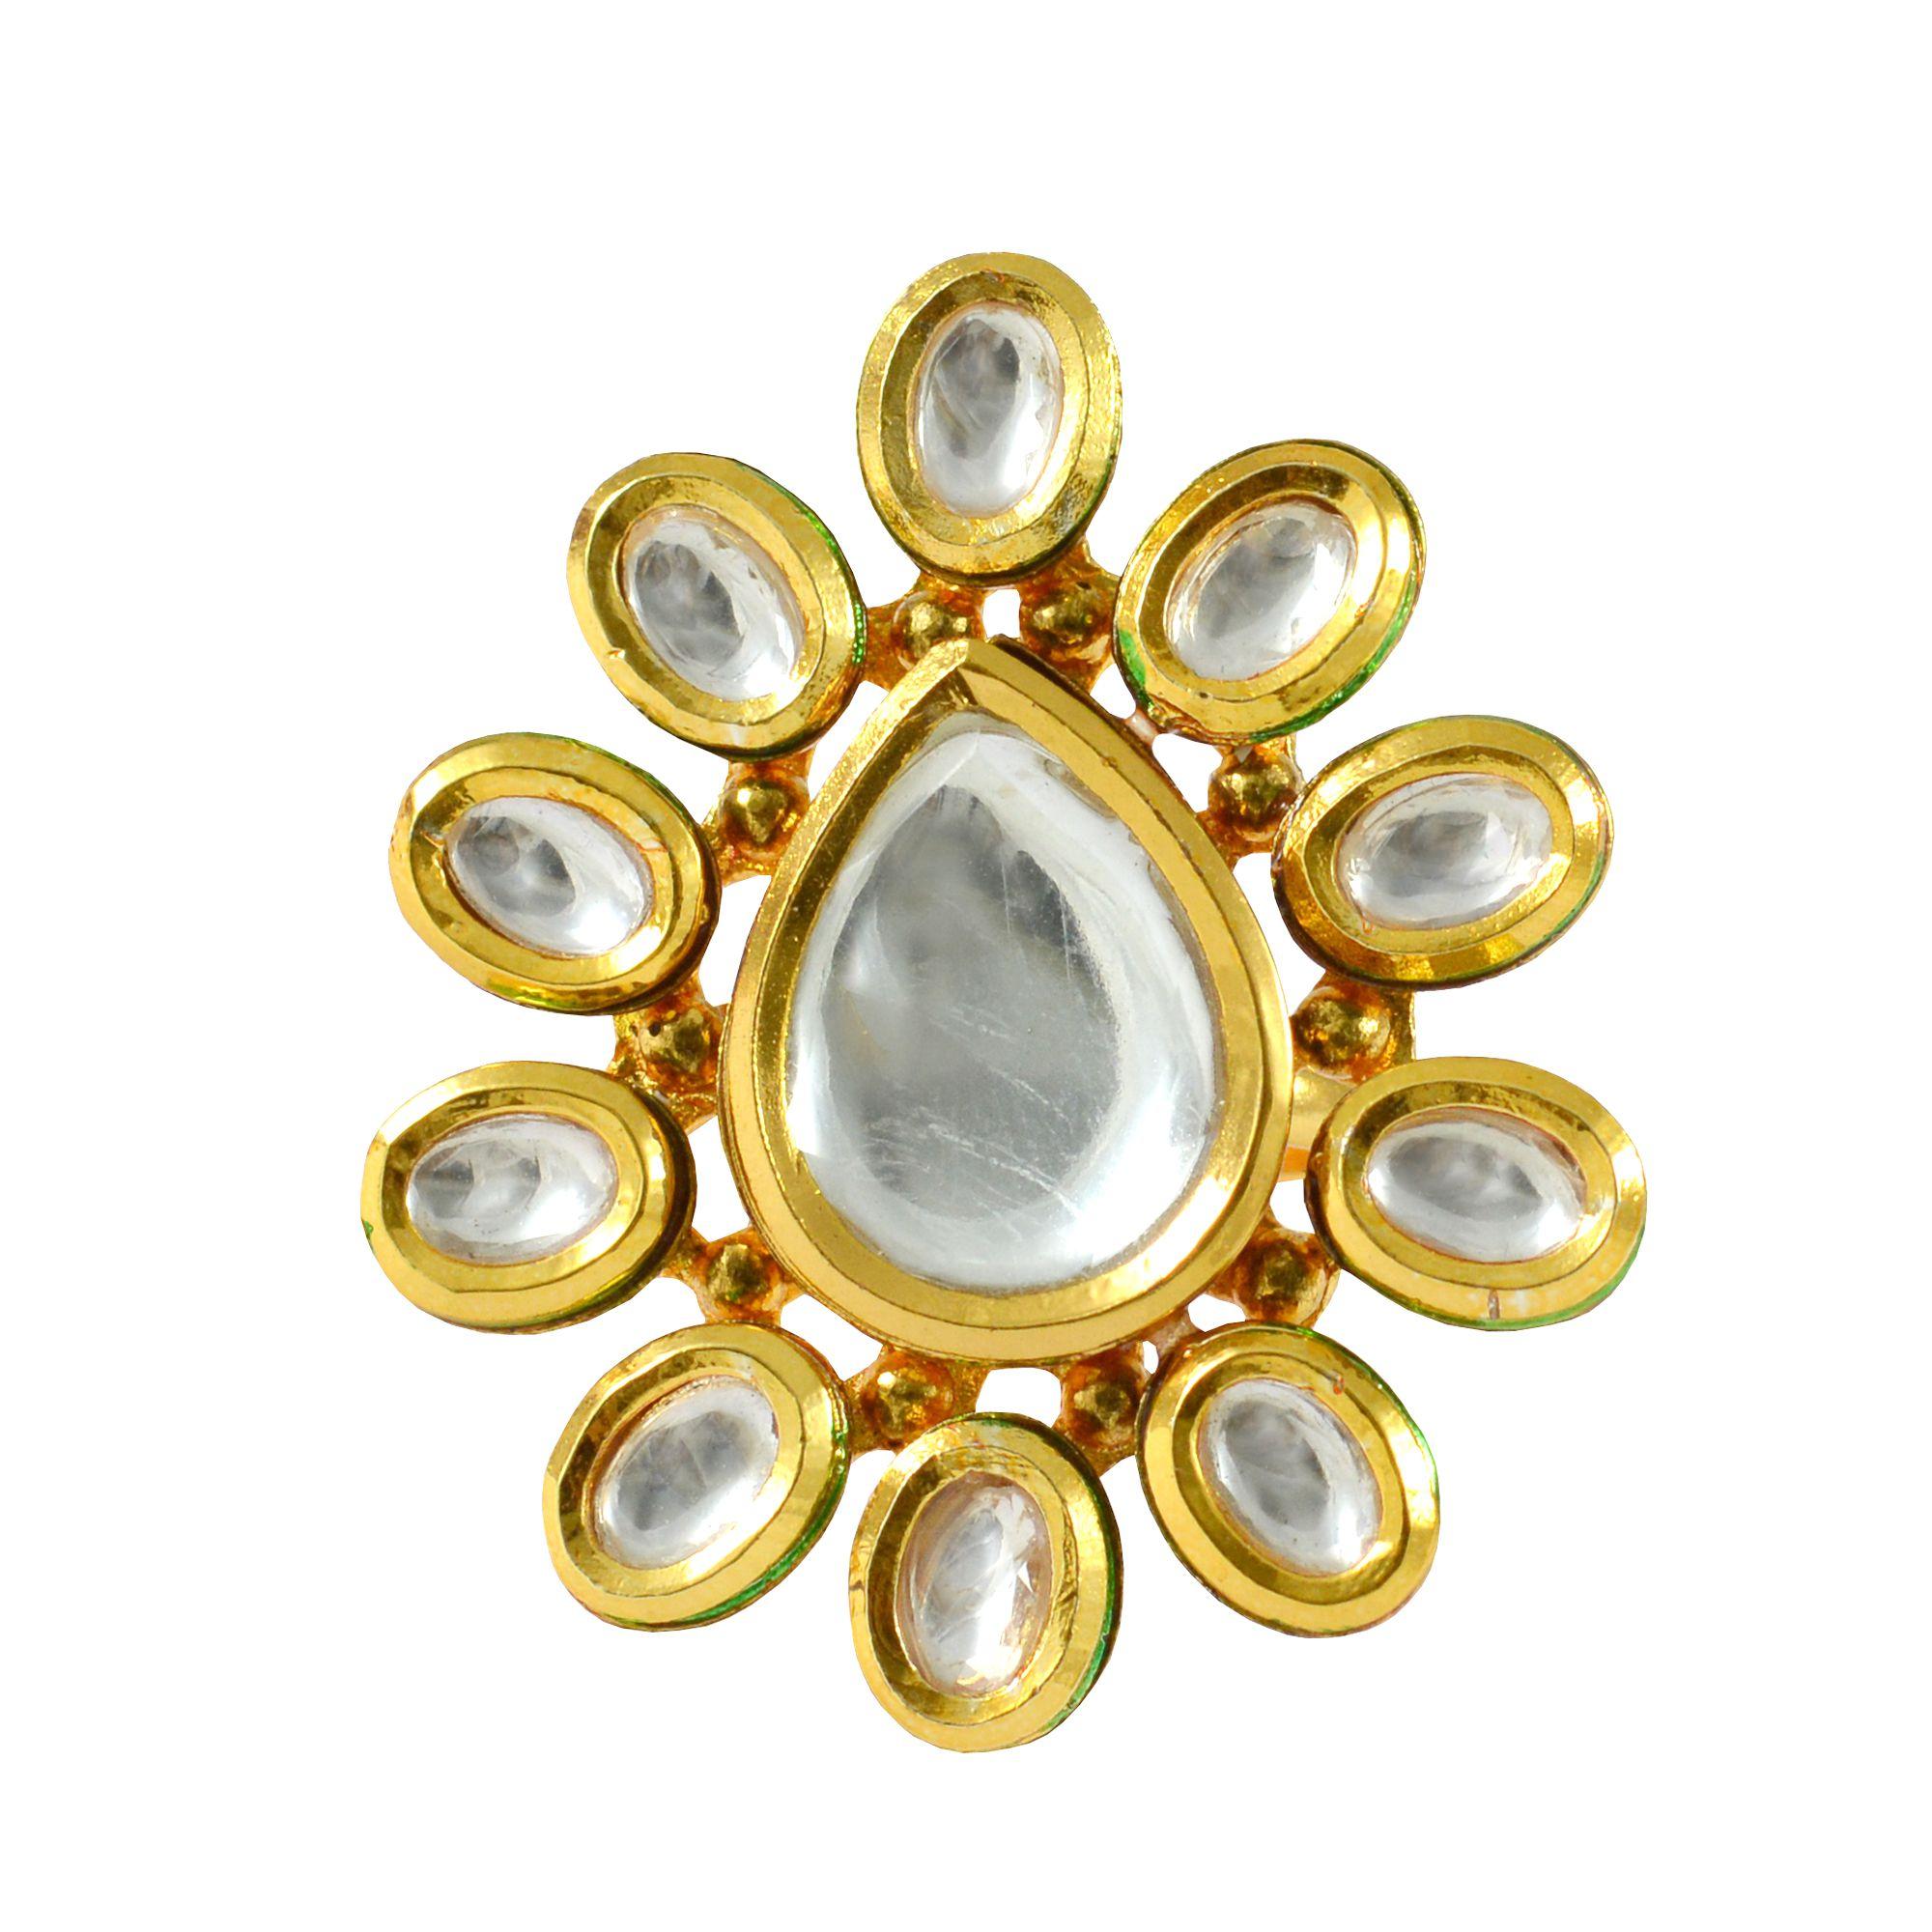 Rejewel Free Size Polki Ring For Women